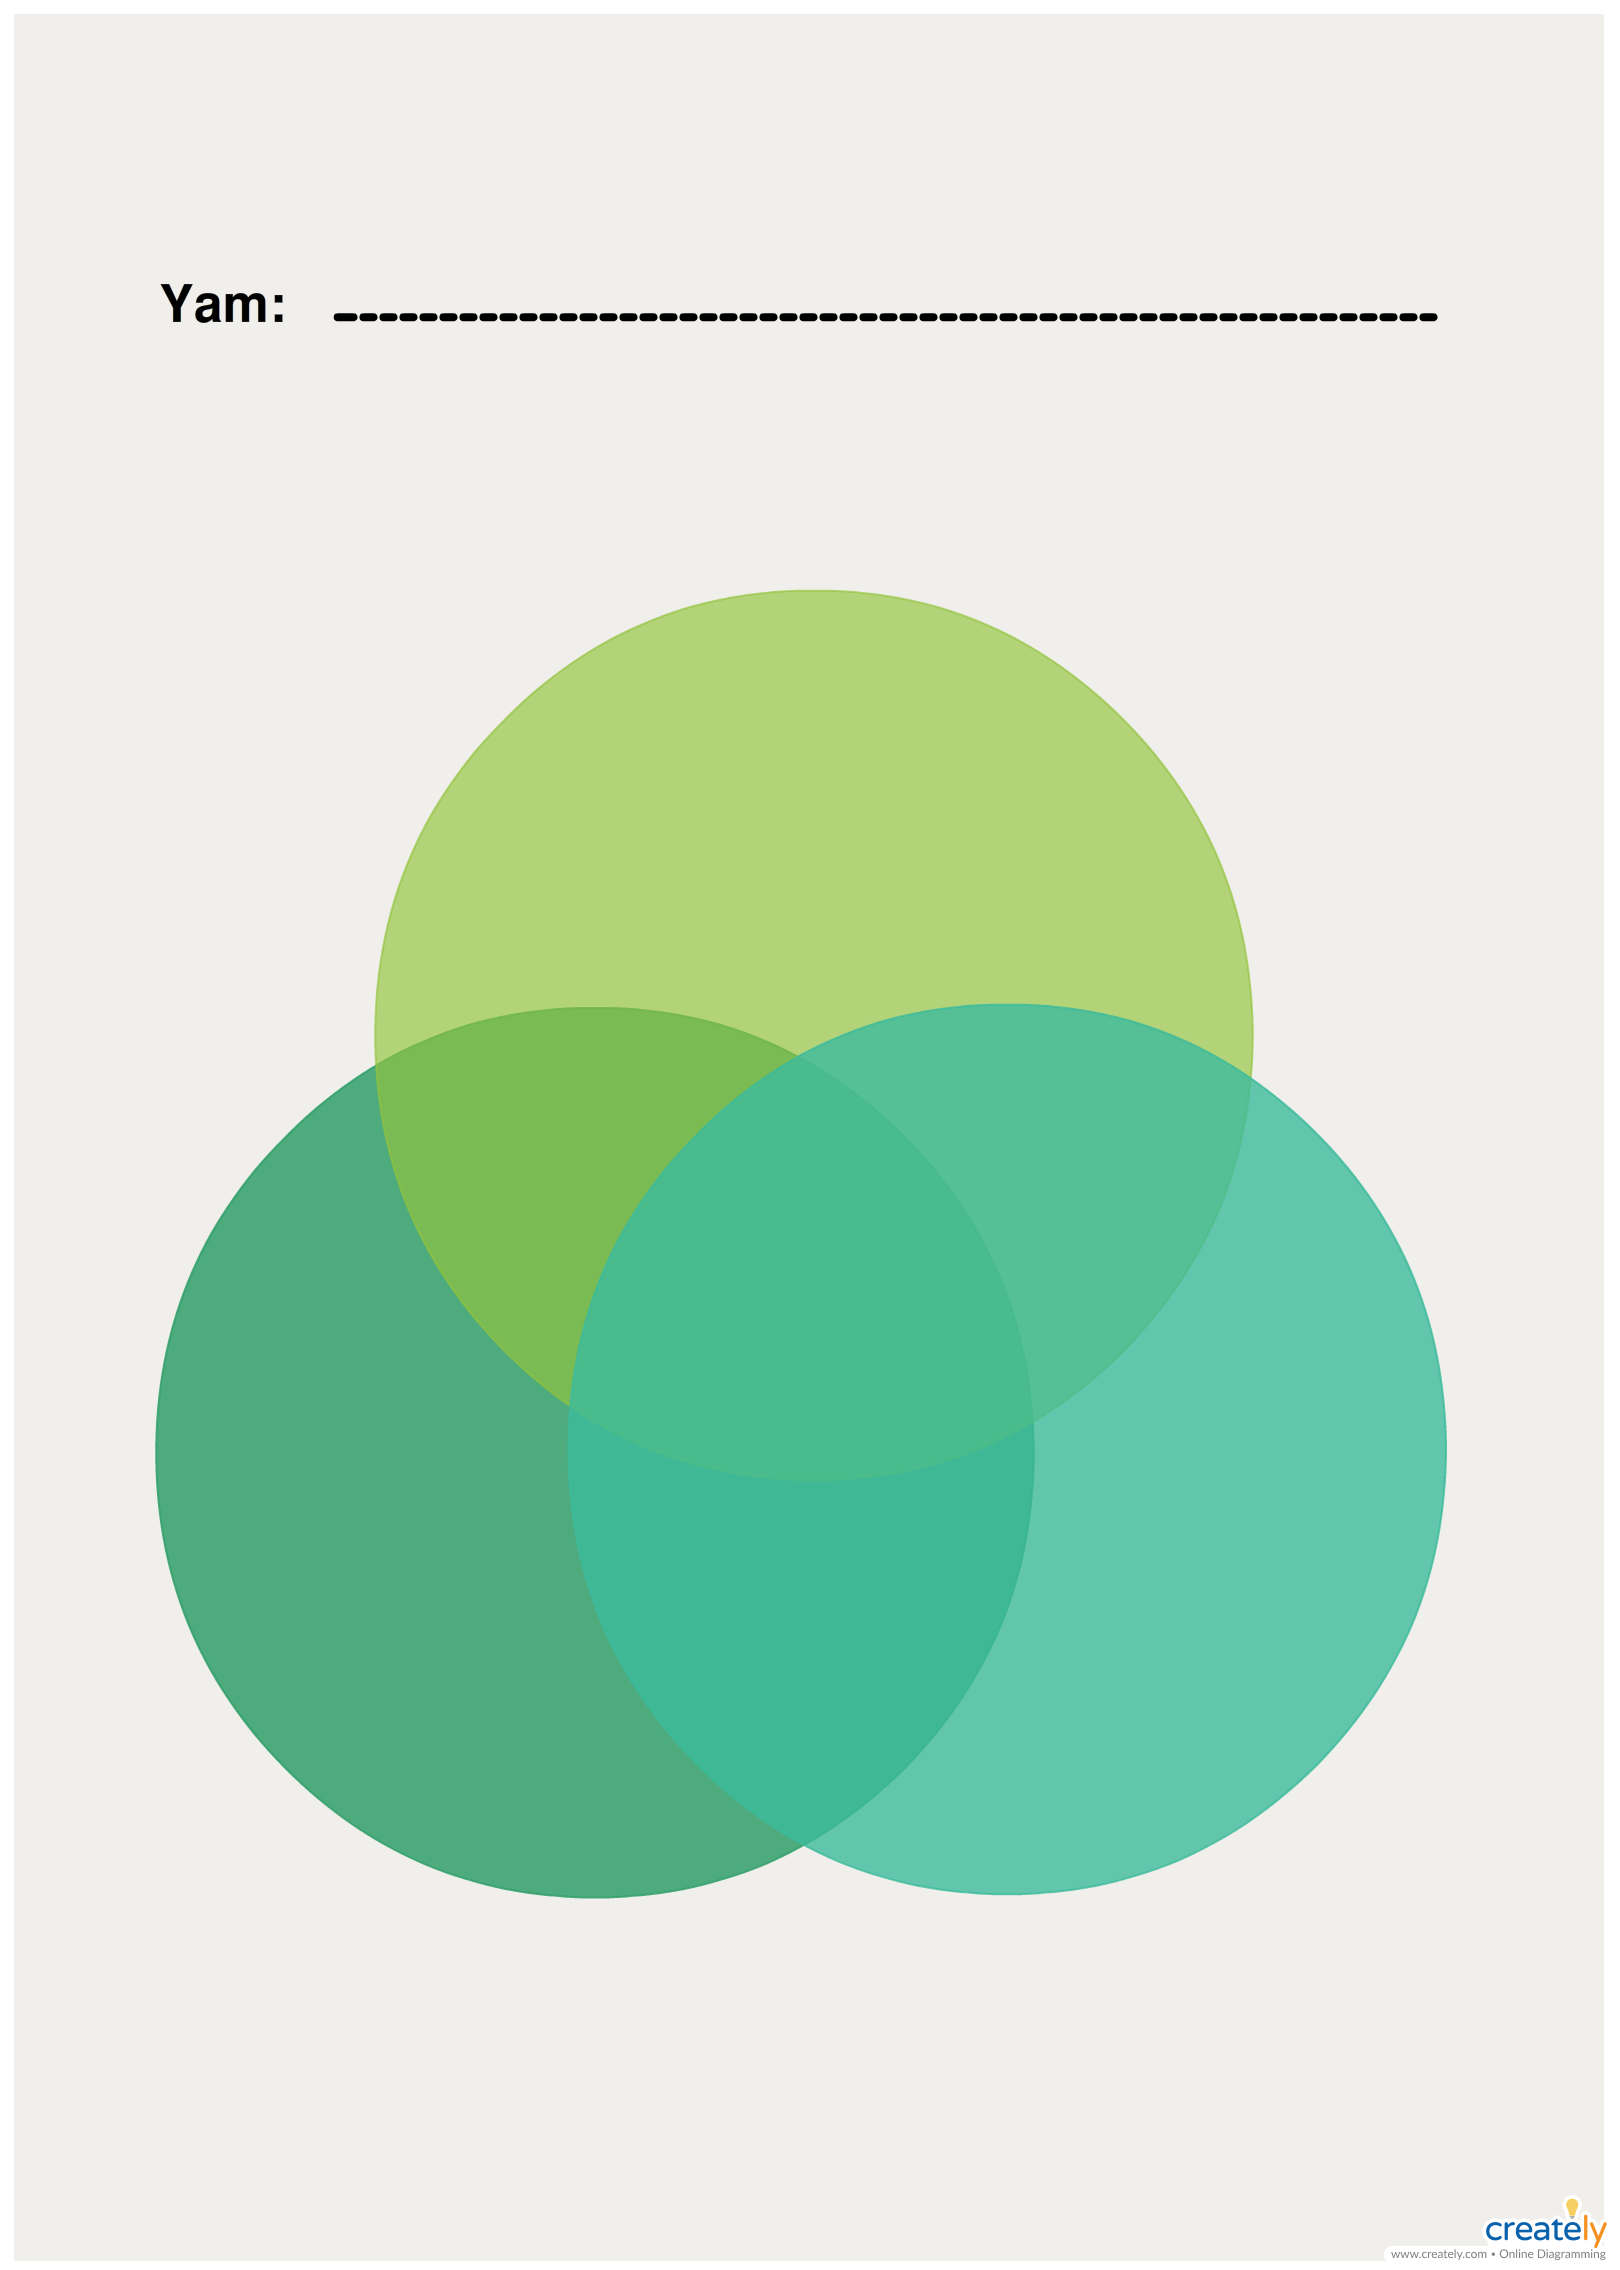 blank 3 set de diagrama venn listo para imprimir para hoja a4 puedes editar esta [ 1620 x 2270 Pixel ]